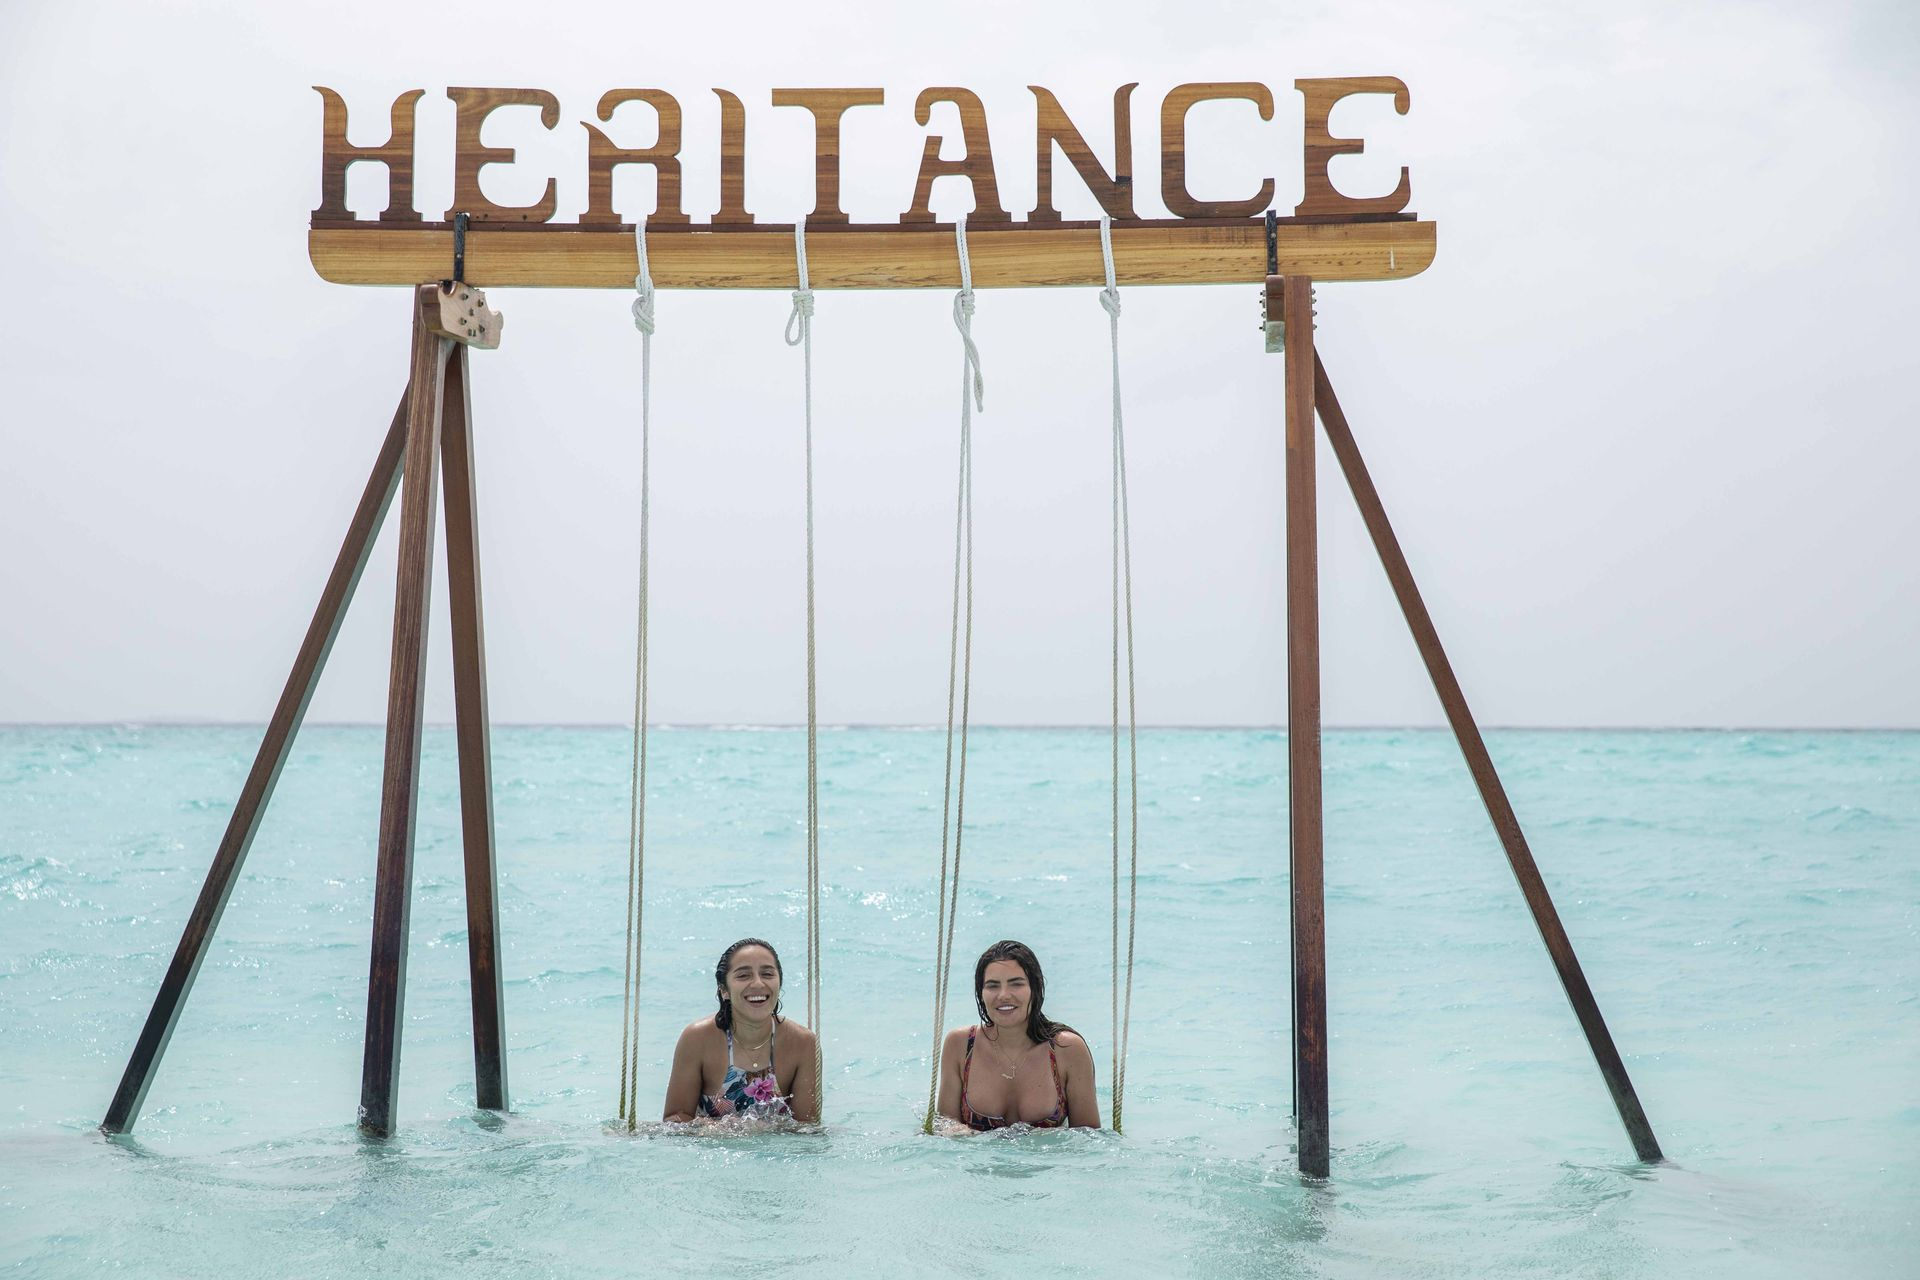 Megan Barton Hanson And Her Girlfriend Seen Enjoying Their Lesbian Holiday 0004